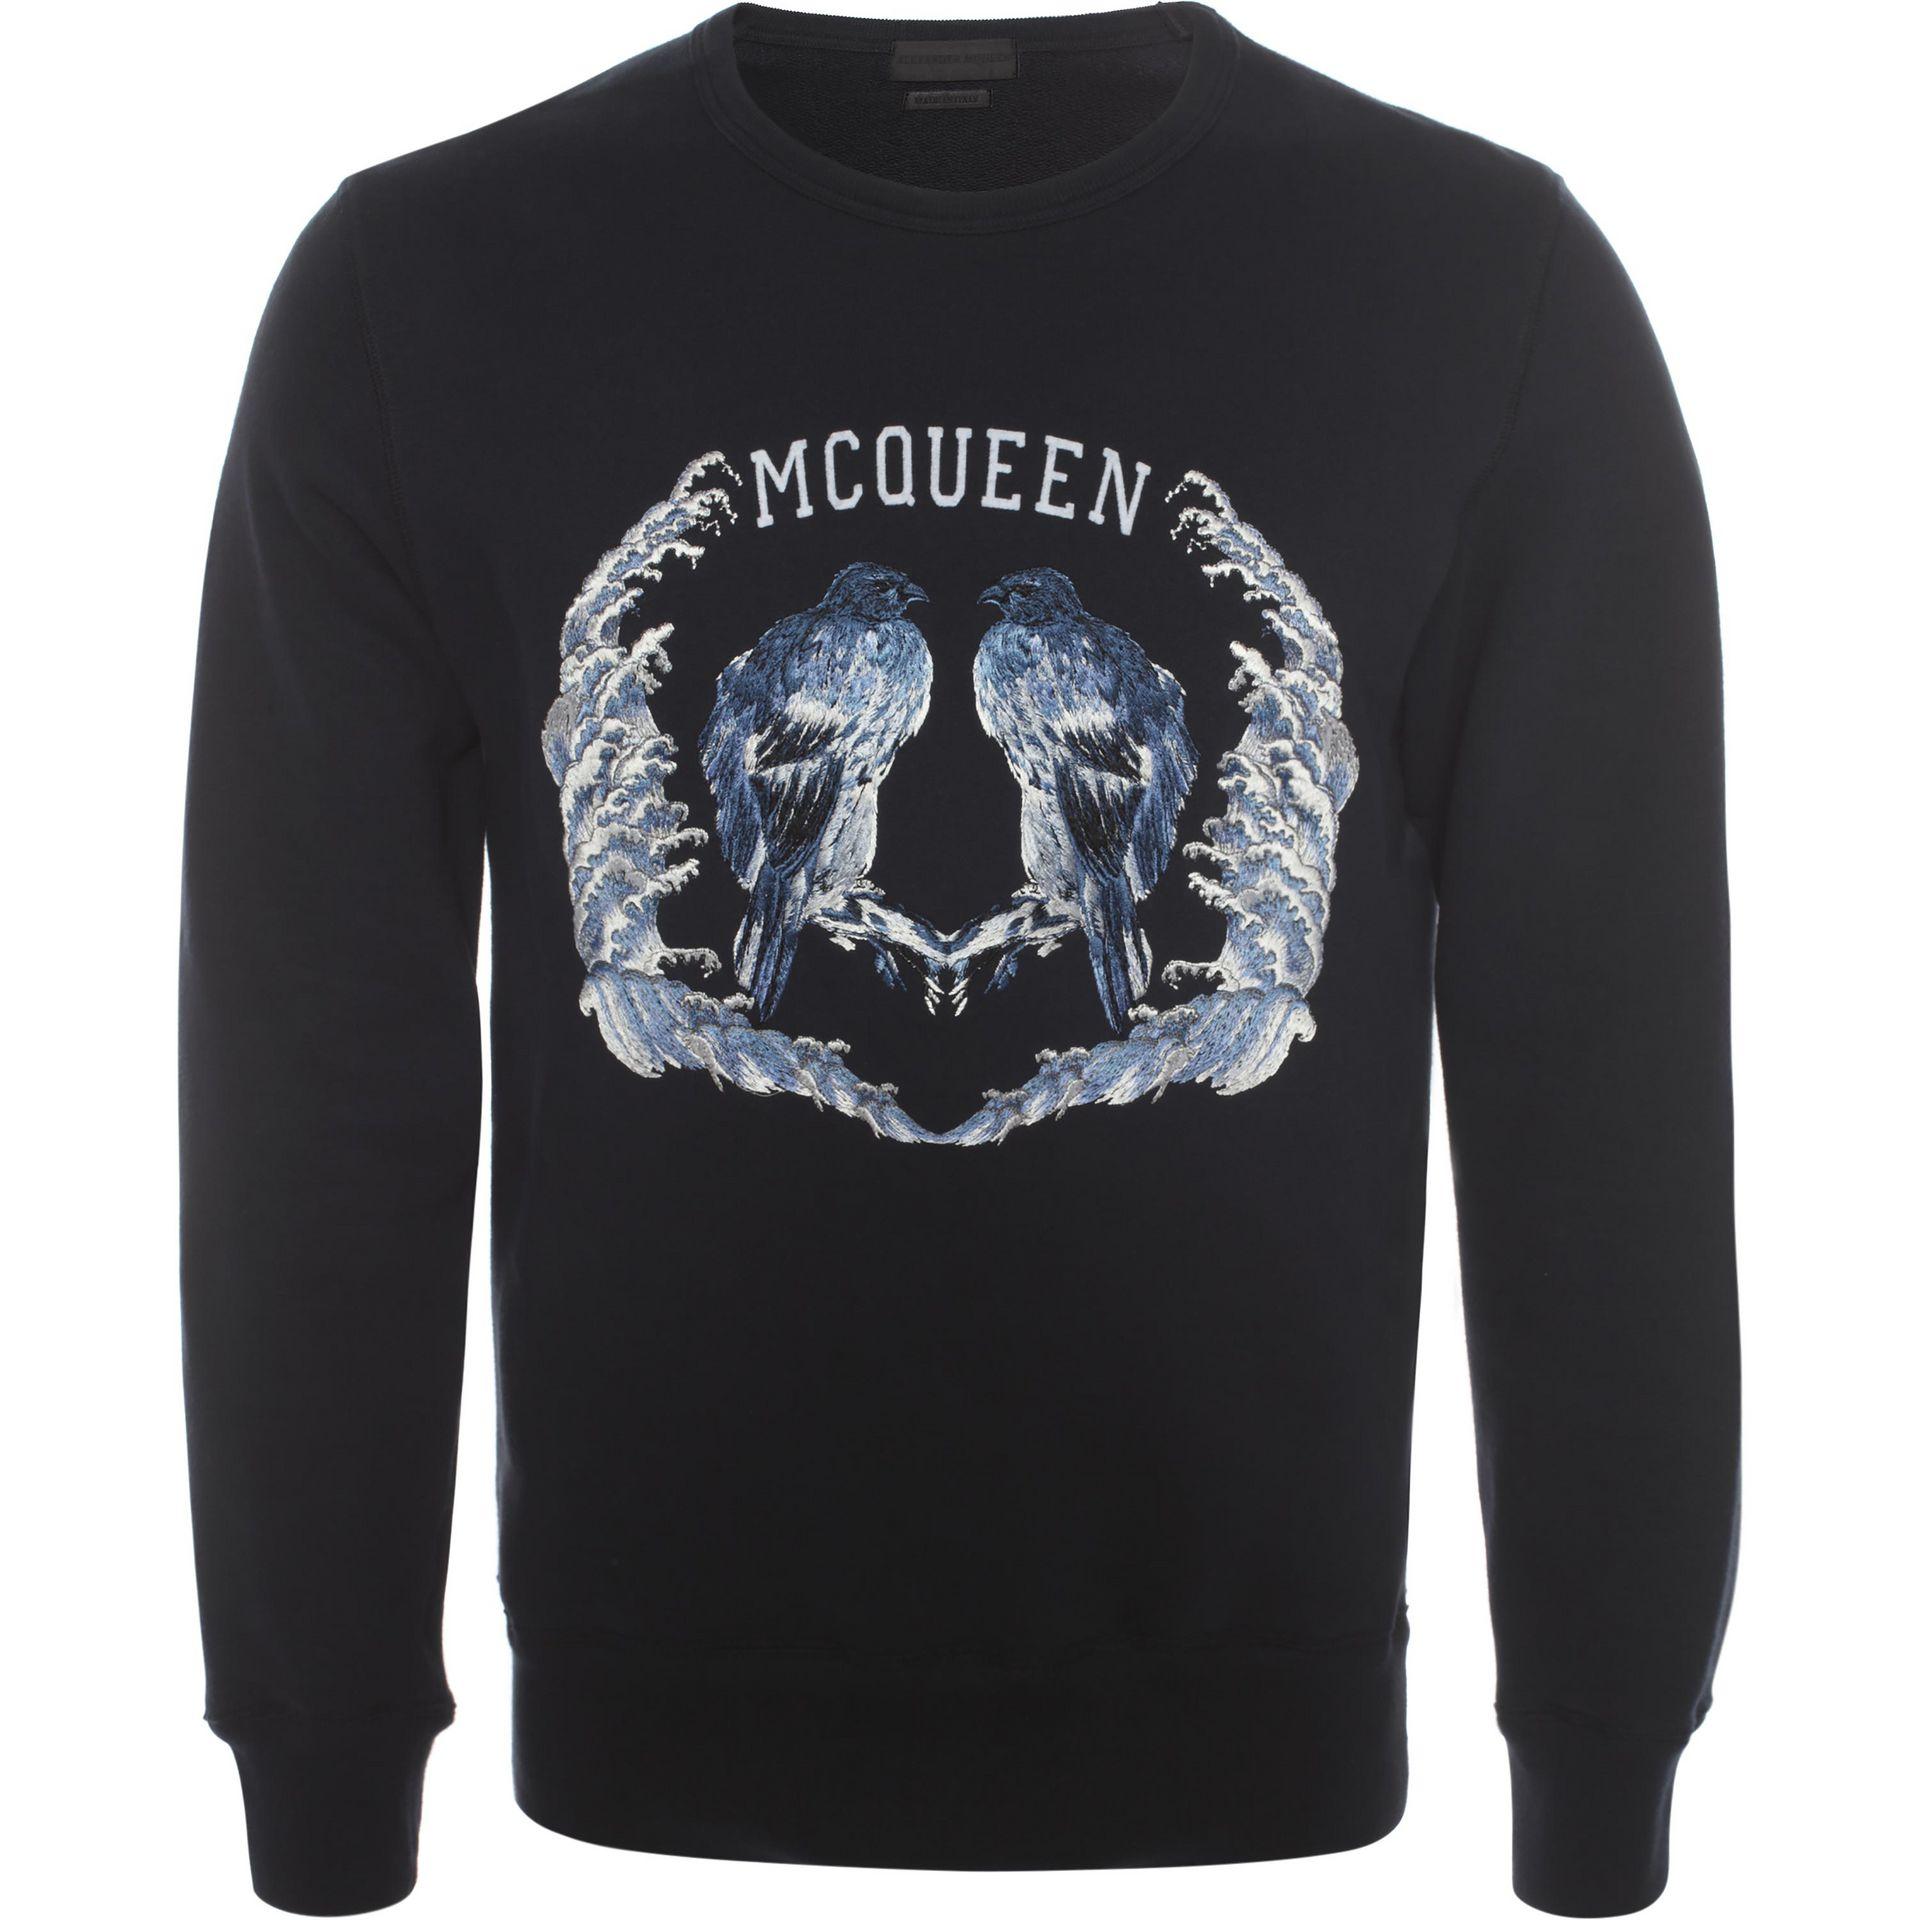 lyst alexander mcqueen embroidered bird sweatshirt in blue for men. Black Bedroom Furniture Sets. Home Design Ideas